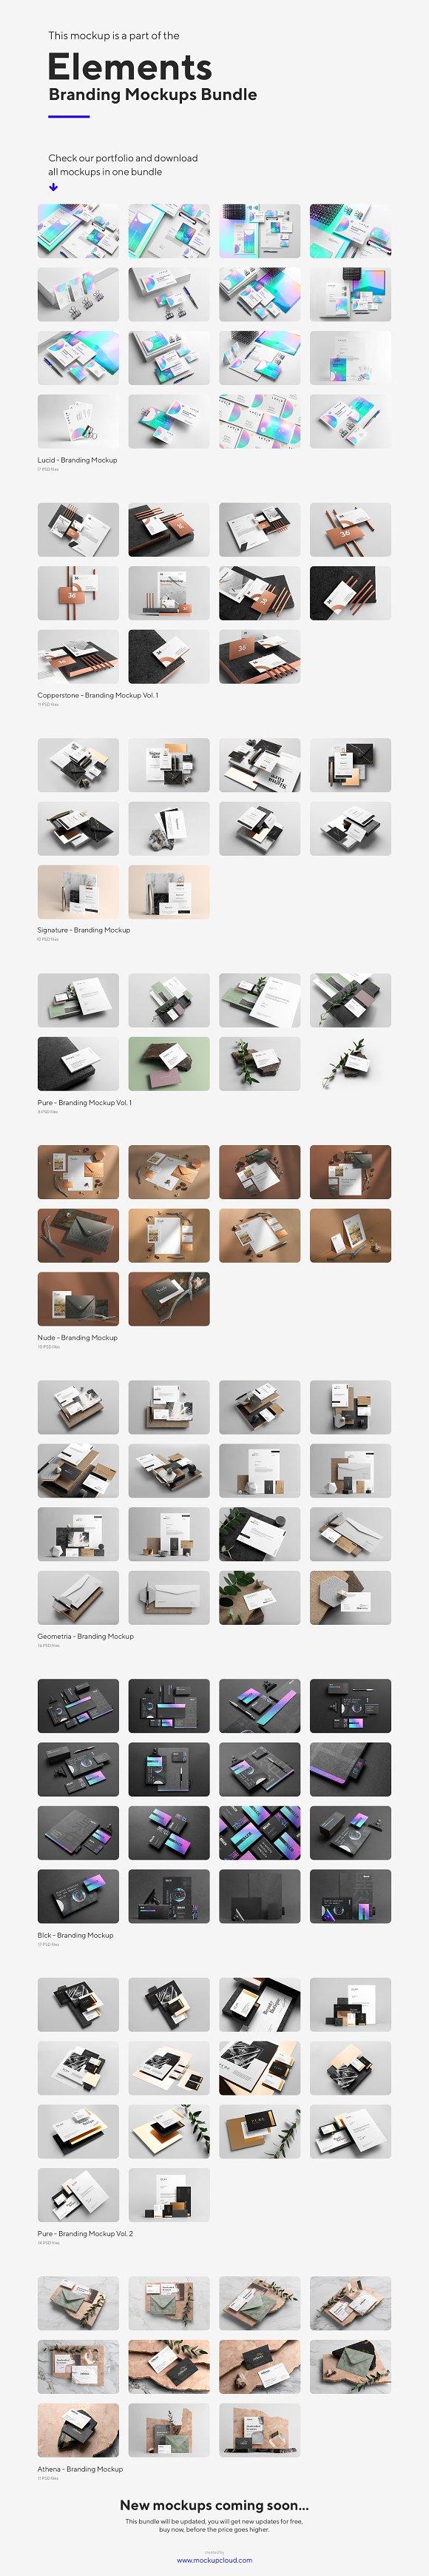 Blck Branding Mockup in Branding Mockups - product preview 17